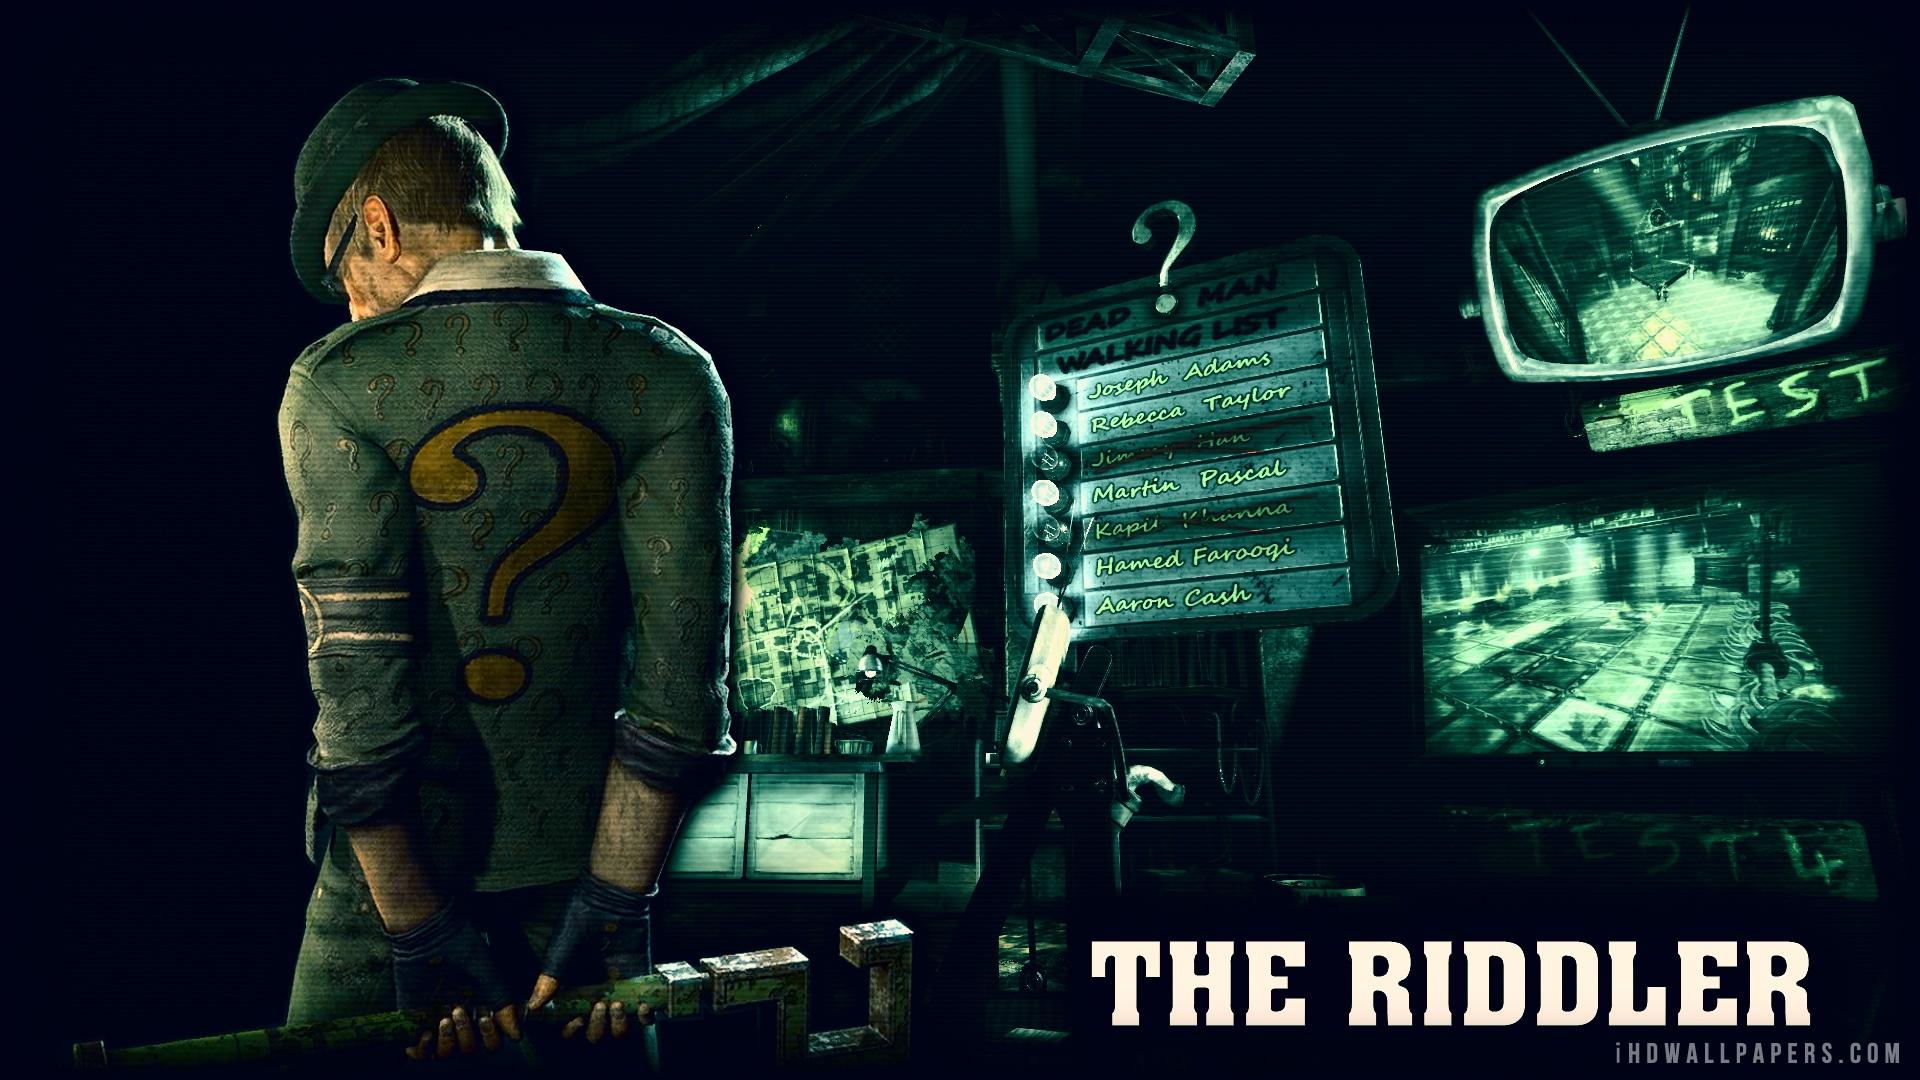 Batman Arkham City Riddler Wallpaper - WallpaperSafari